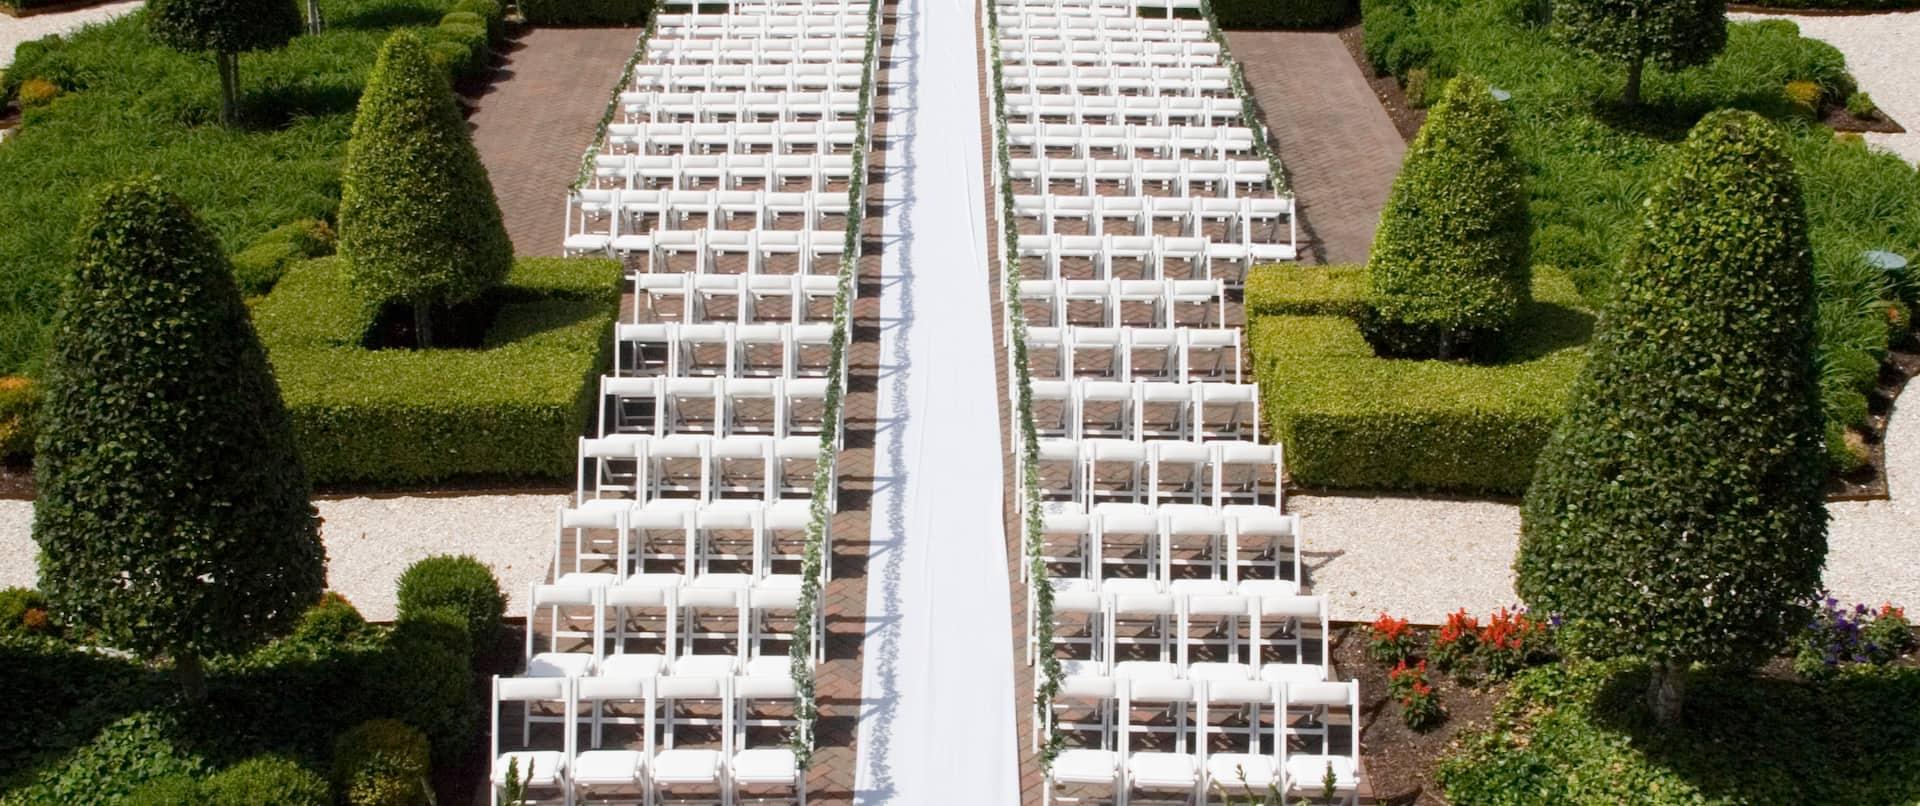 Wedding Ceremony Setup in Outdoor Courtyard